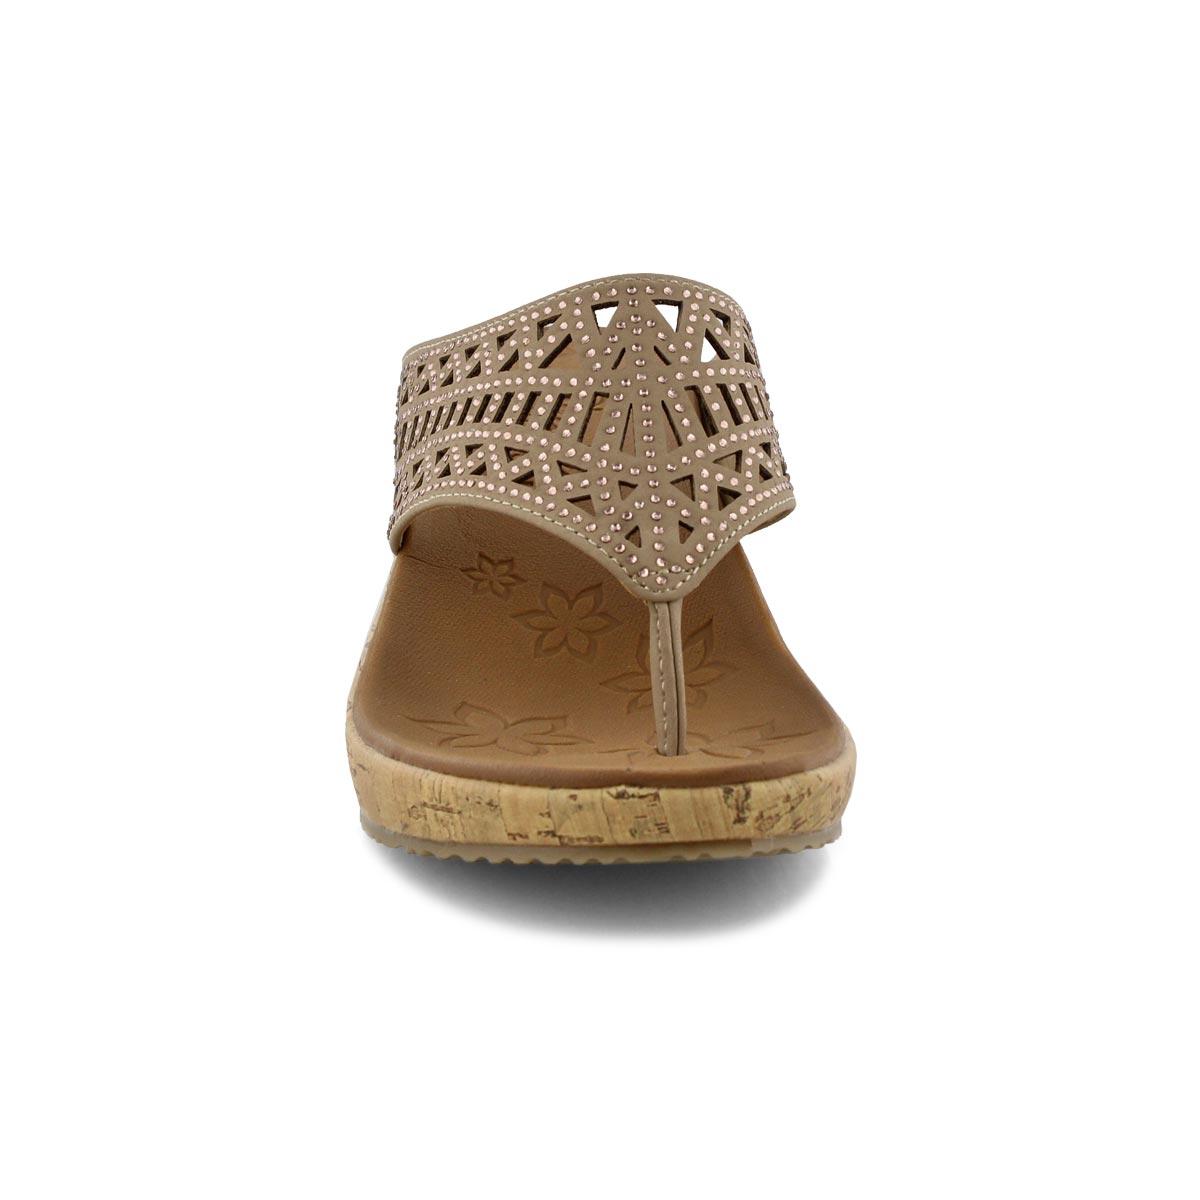 Women's Beverlee Summer Visit Sandal - Taupe